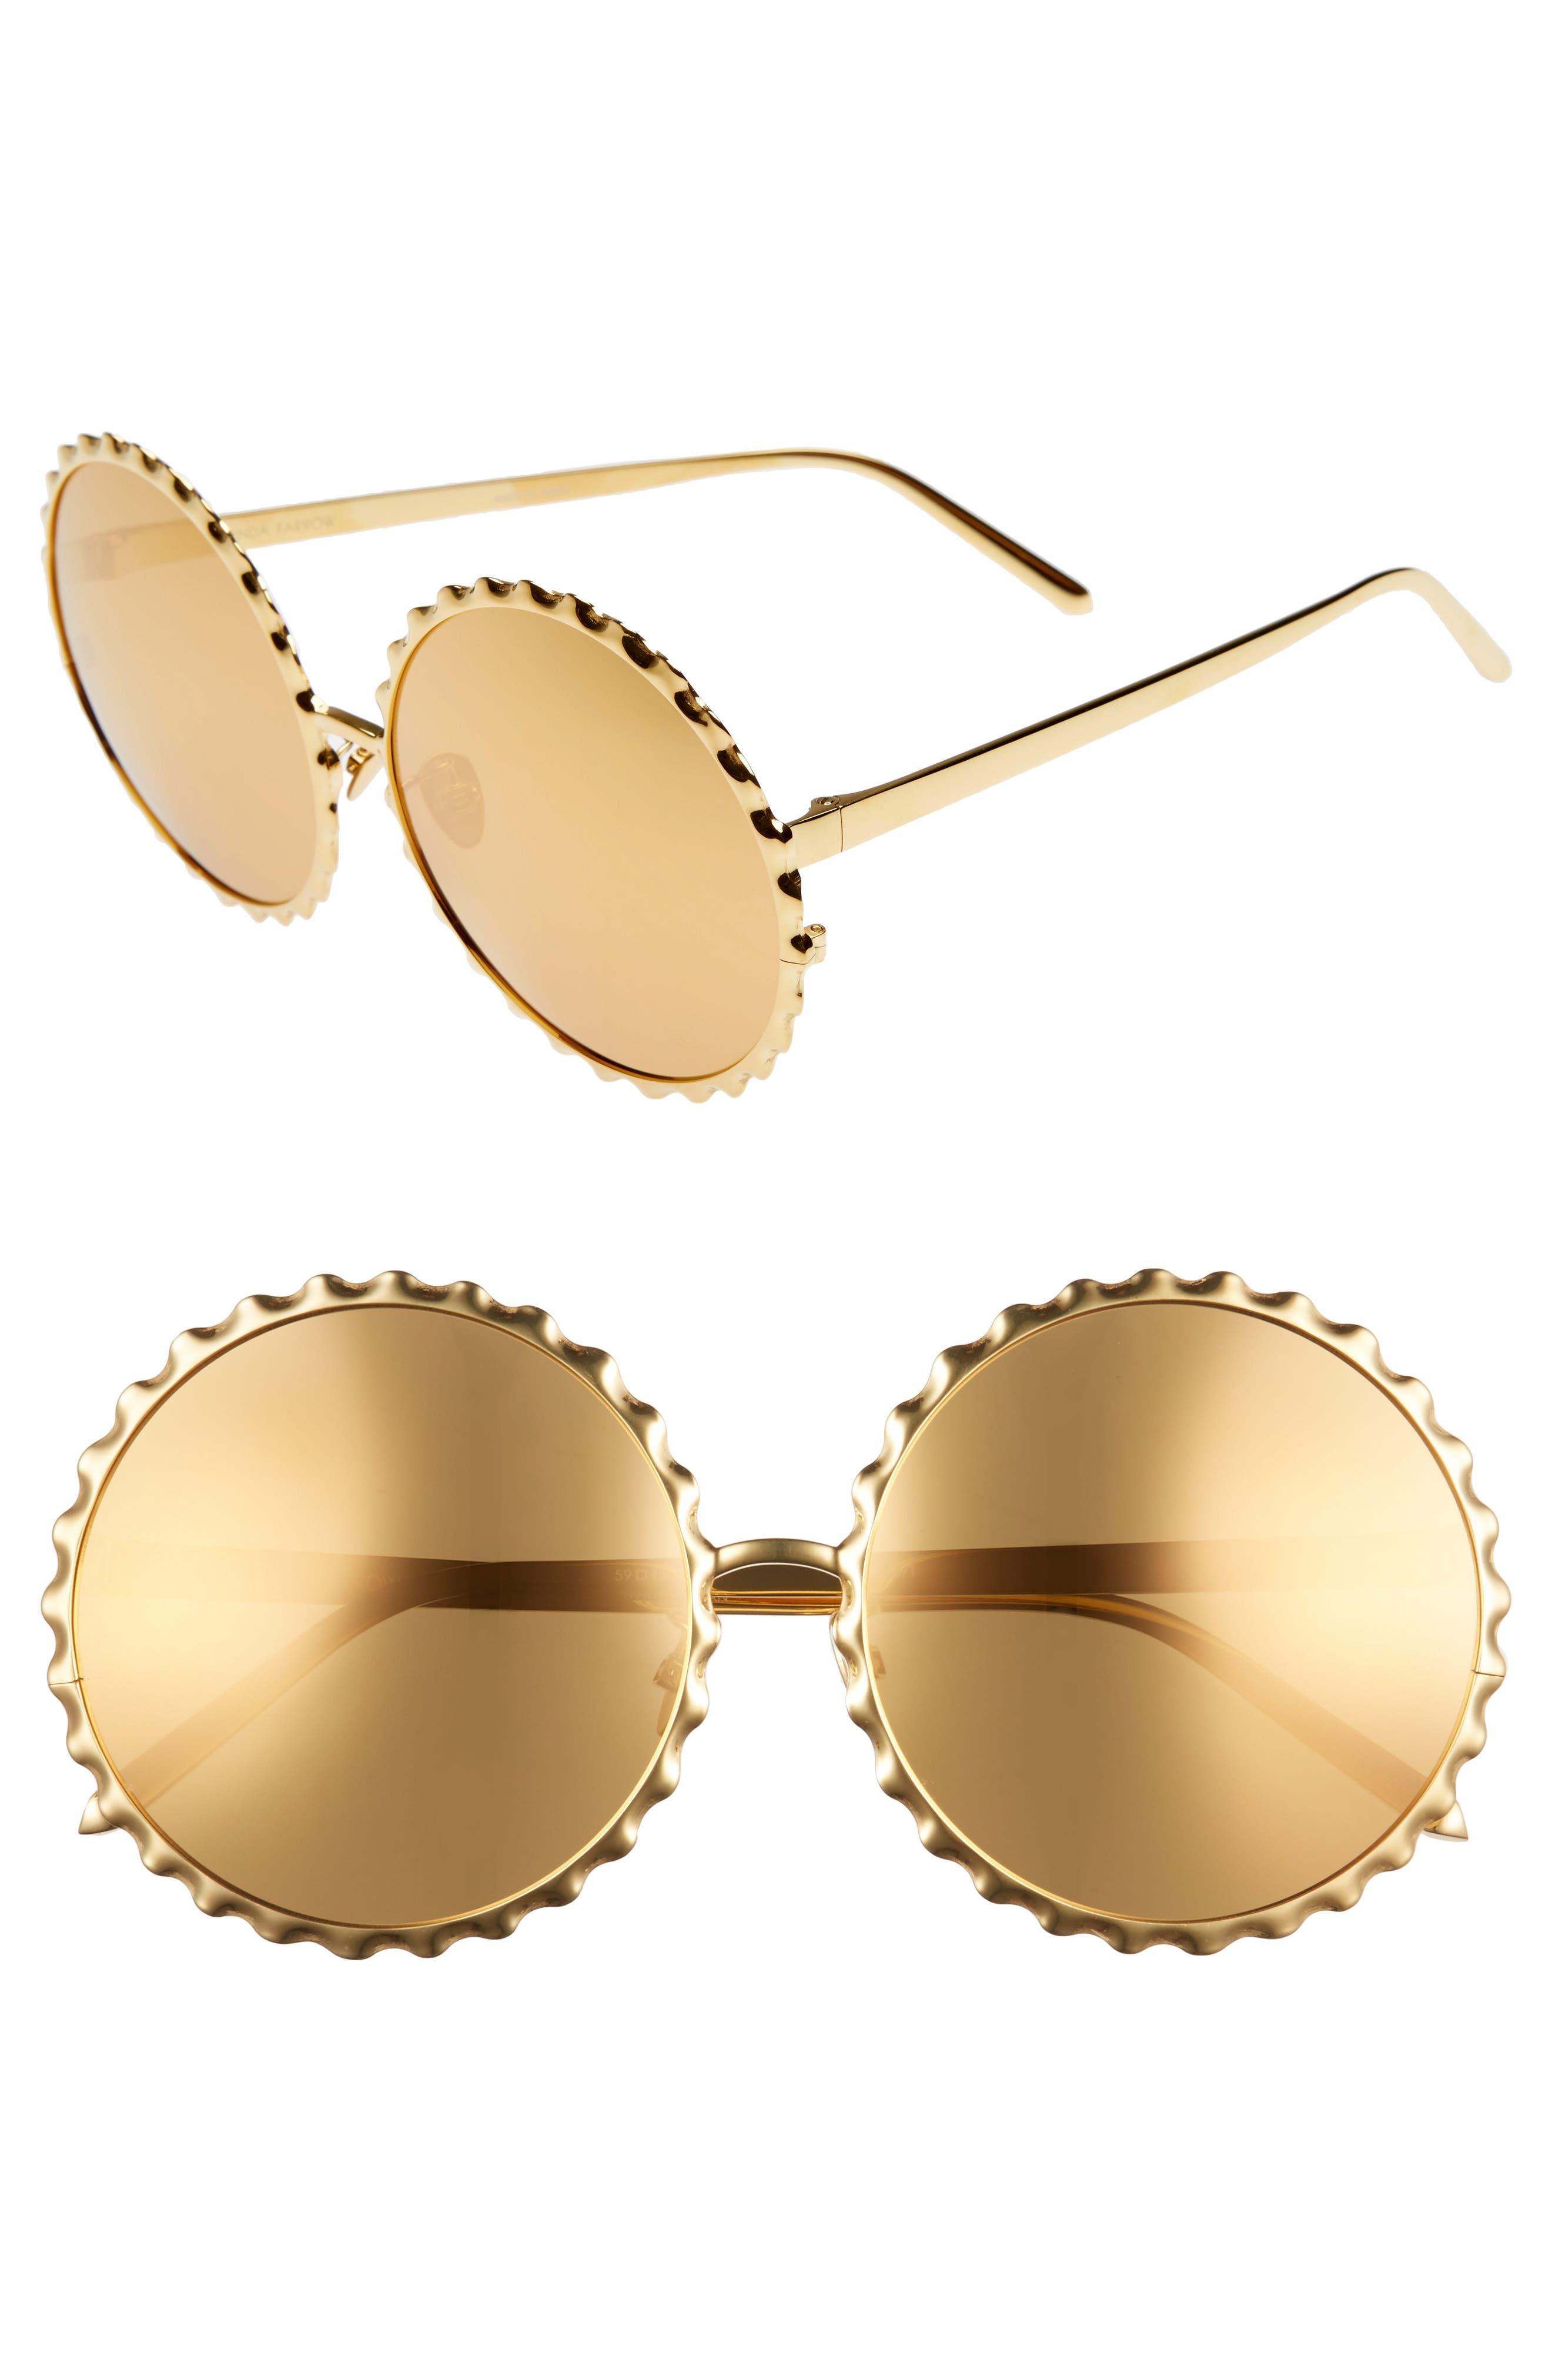 Main Image - Linda Farrow 59mm Mirrored 18 Karat Gold Trim Round Sunglasses